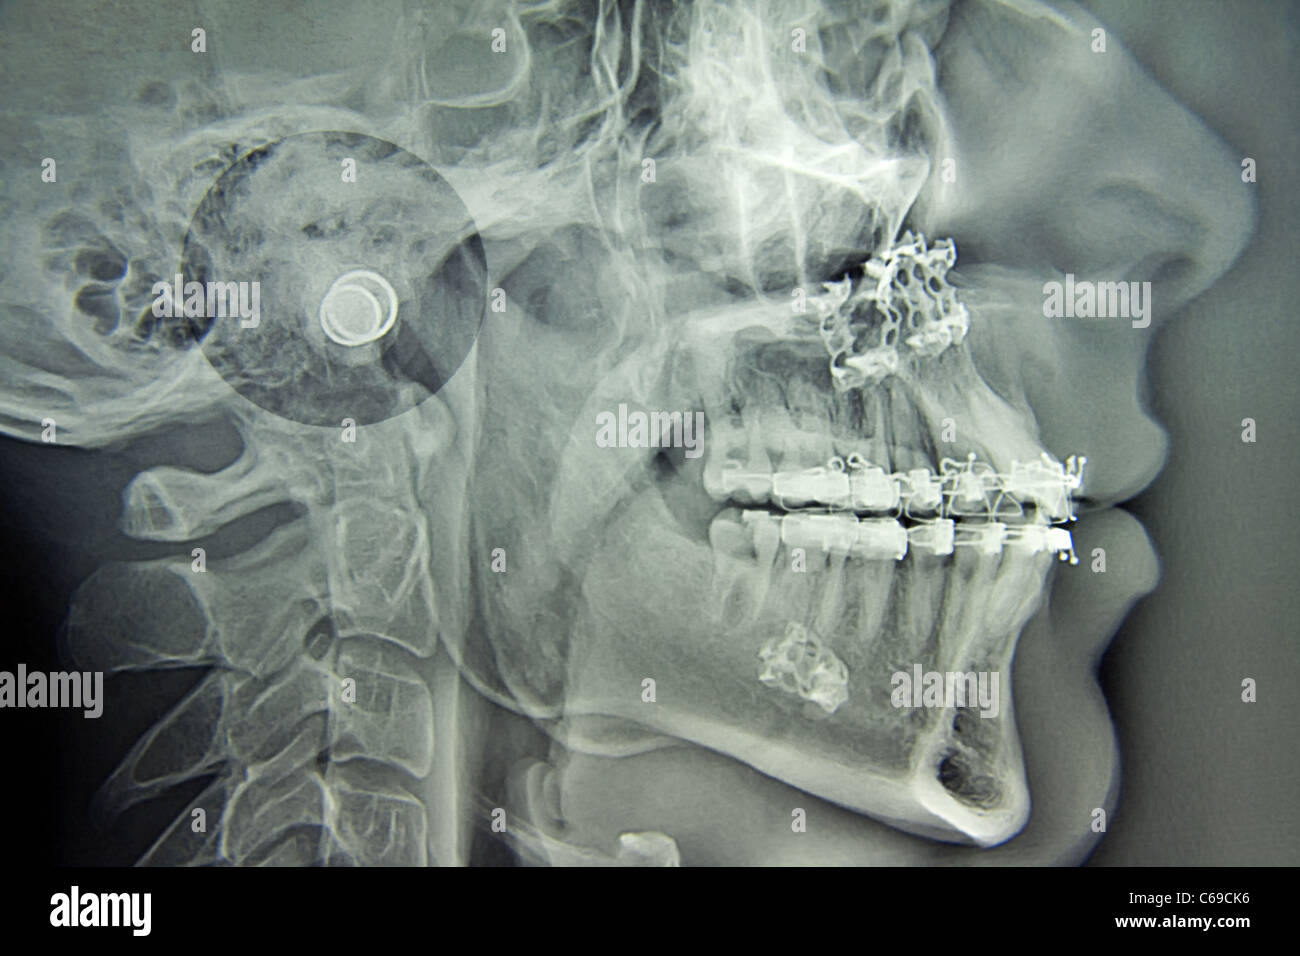 Maxillofacial Surgery - Stock Image